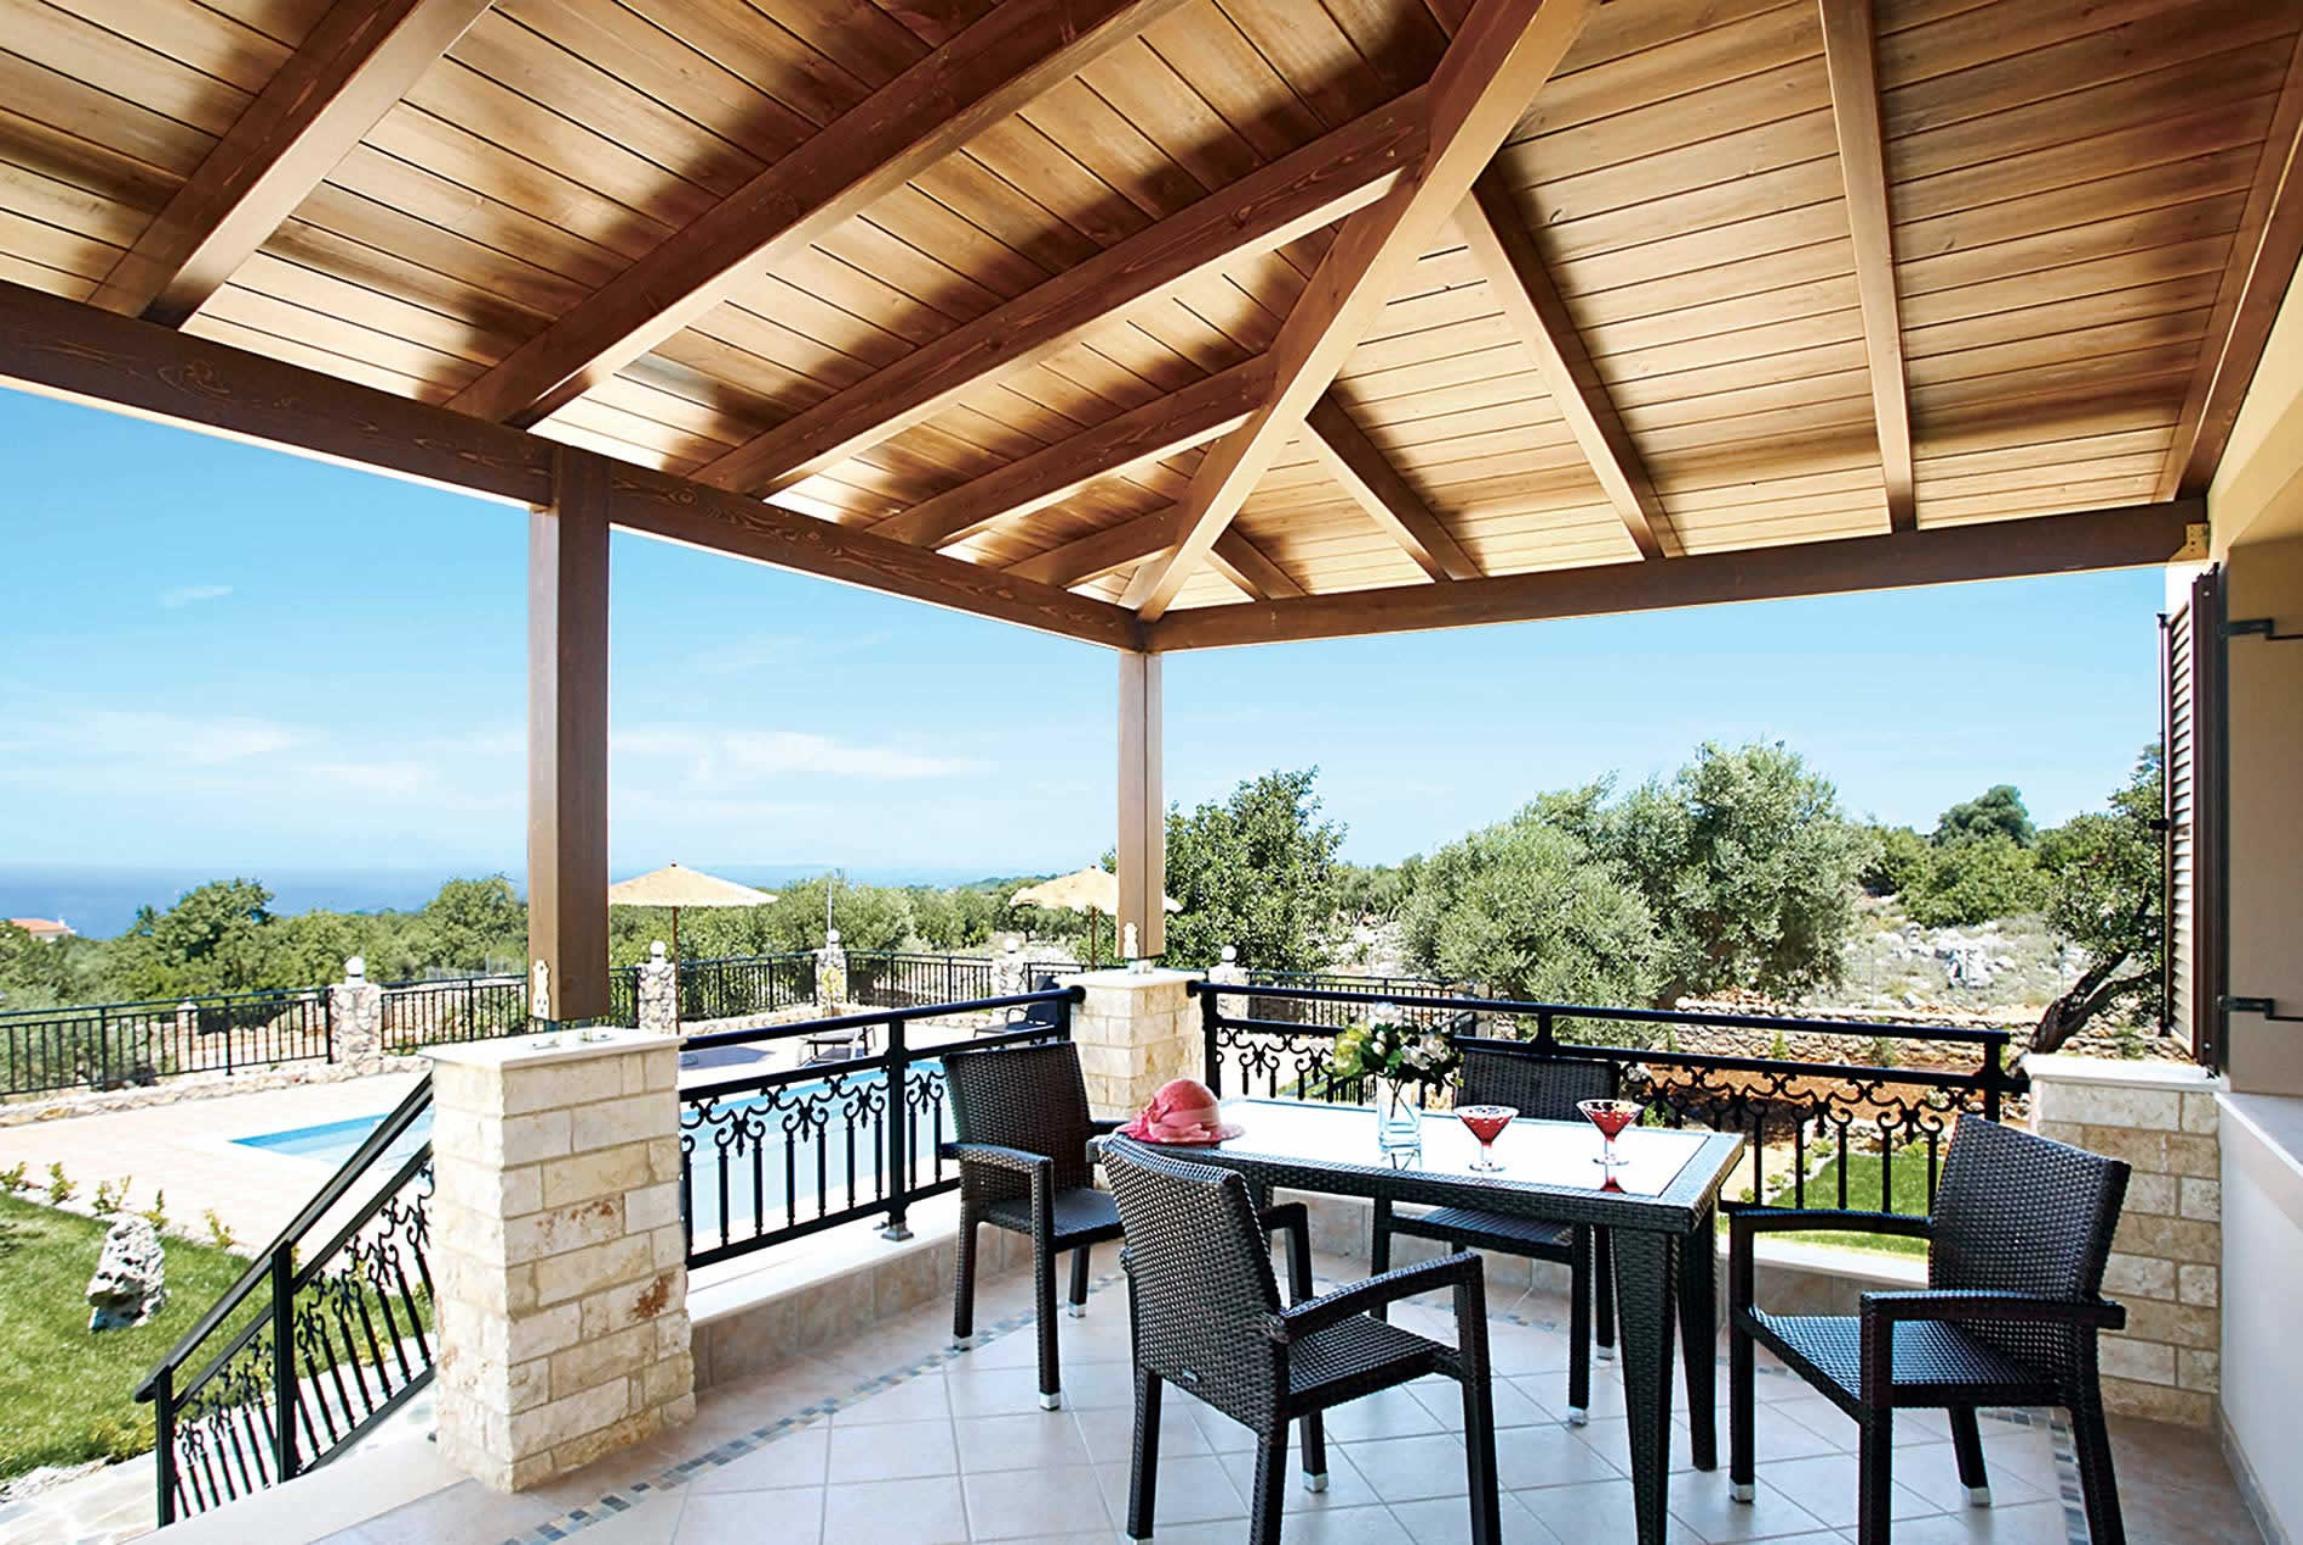 Ferienhaus Nefeli (2653931), Rethymno, Kreta Nordküste, Kreta, Griechenland, Bild 10